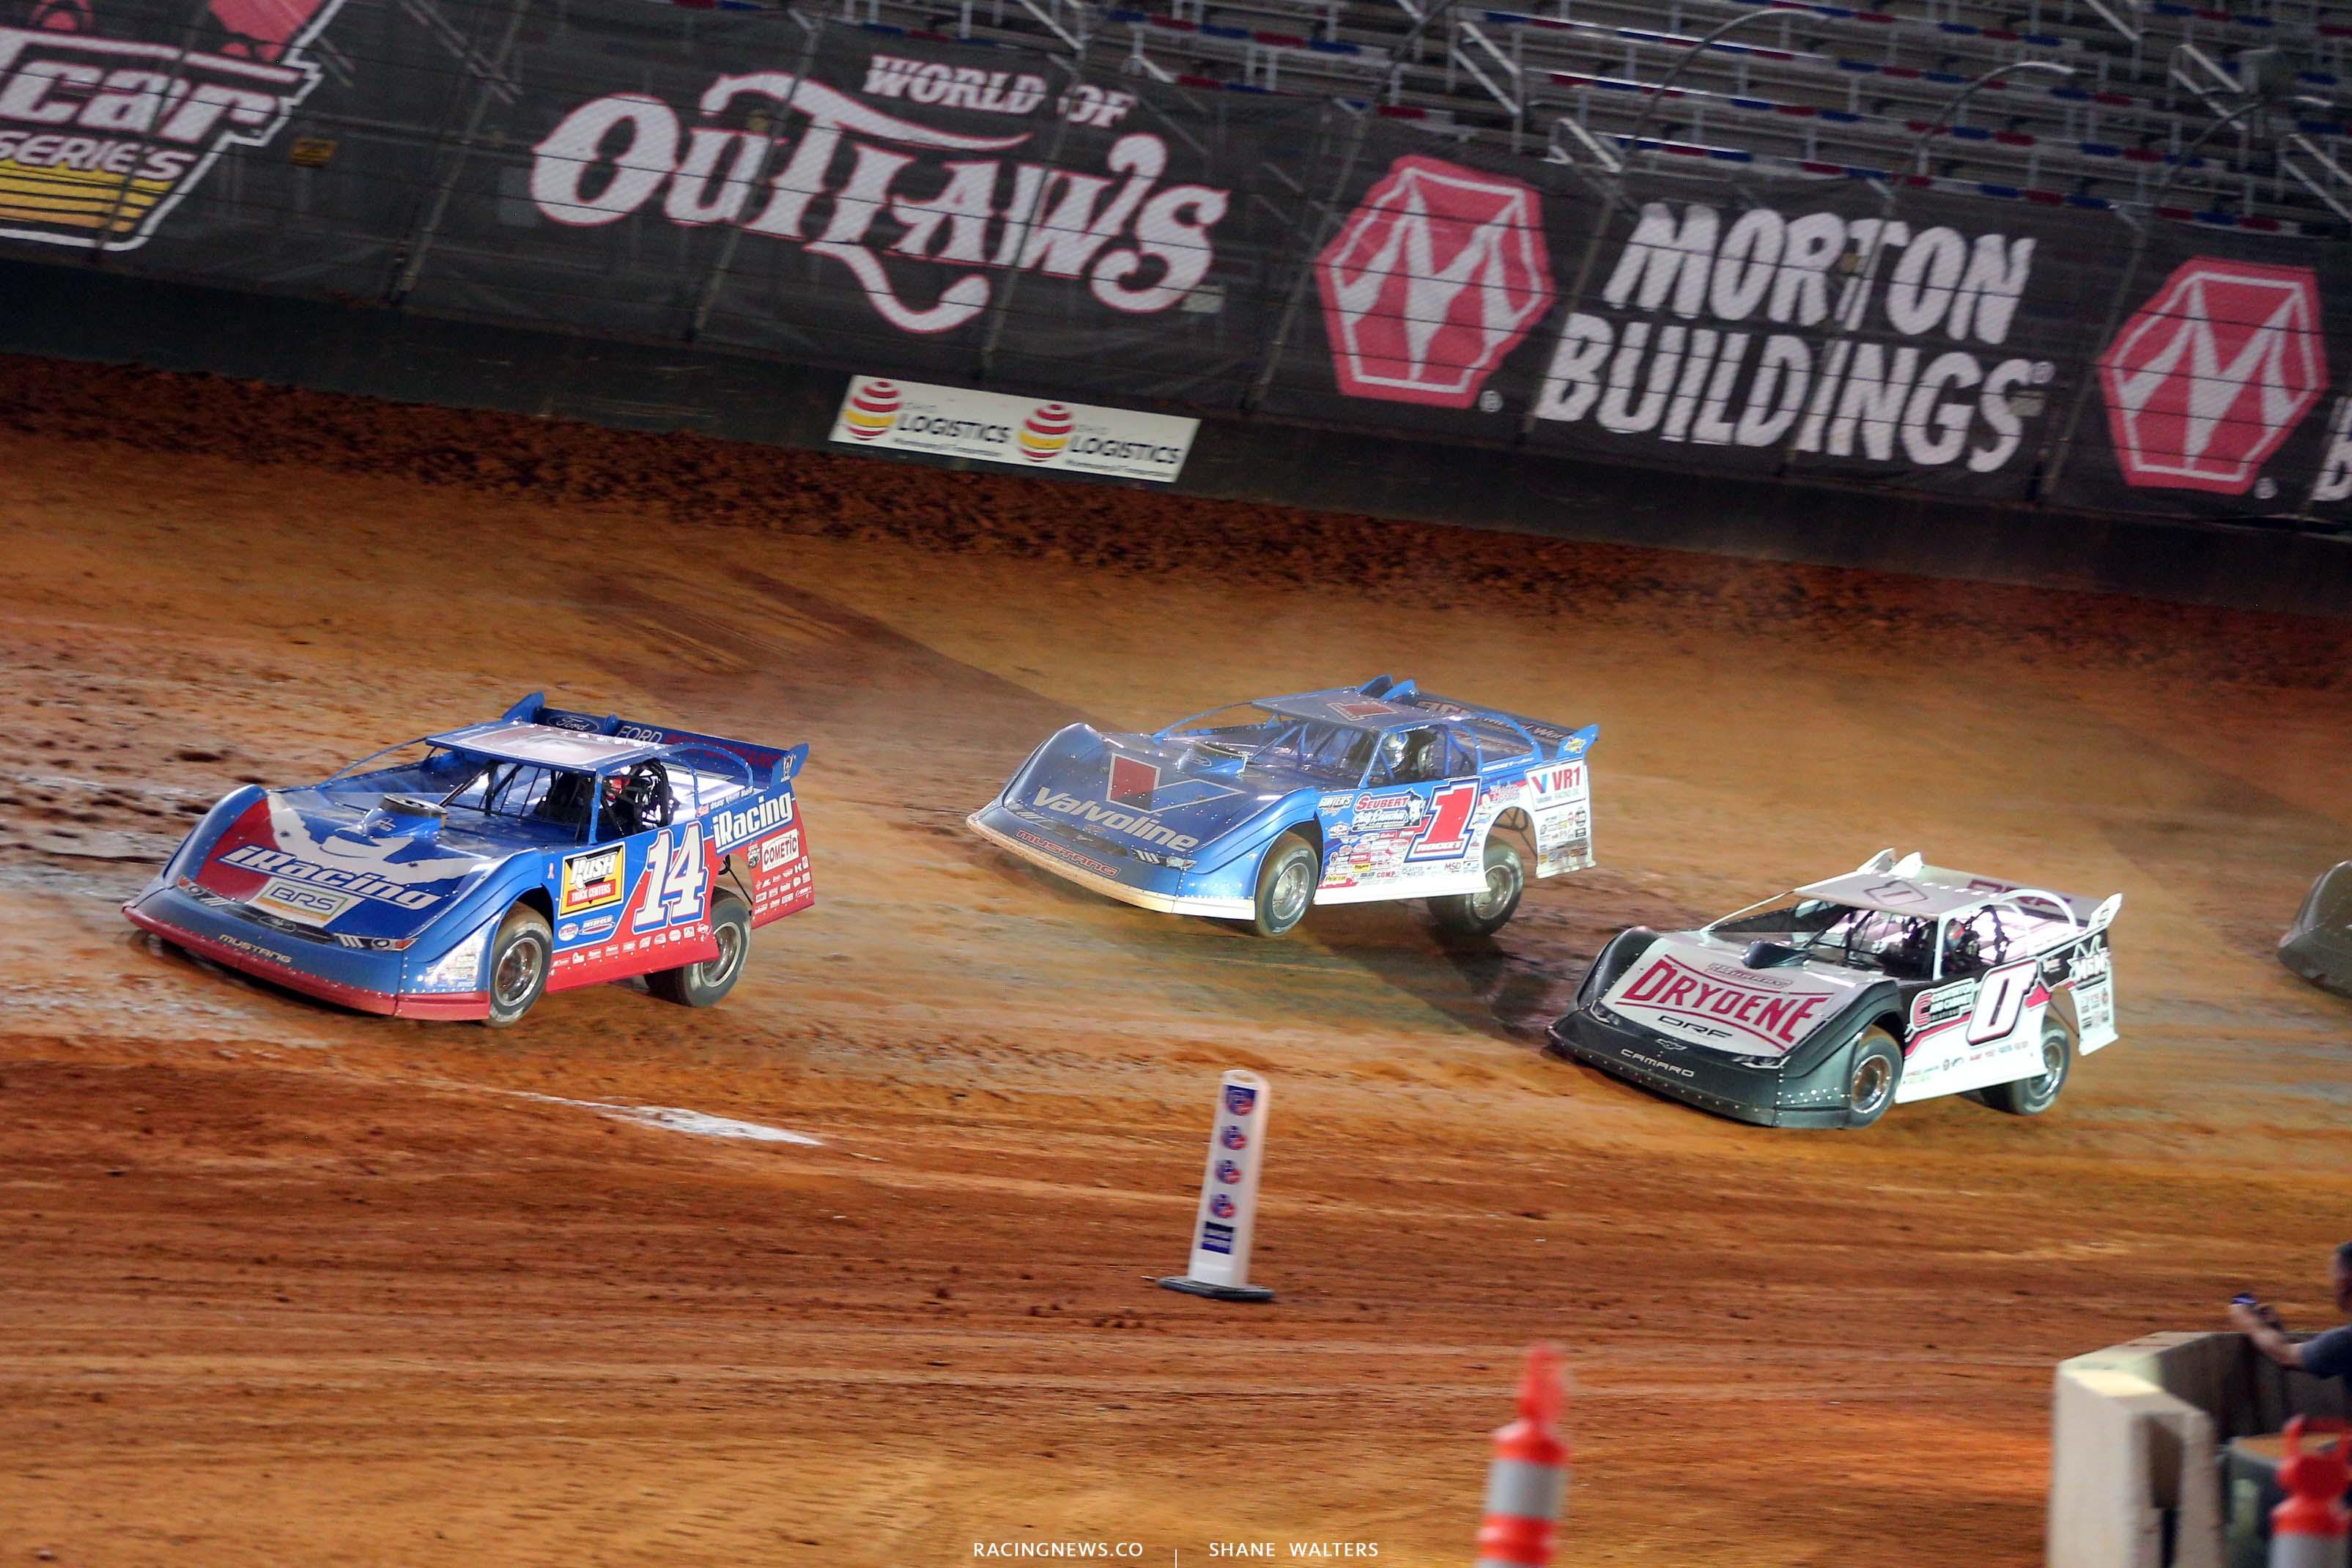 Josh Richards, Brandon Sheppard and Rick Eckert - Bristol Motor Speedway dirt track - World of Outlaws Late Model Series 3784